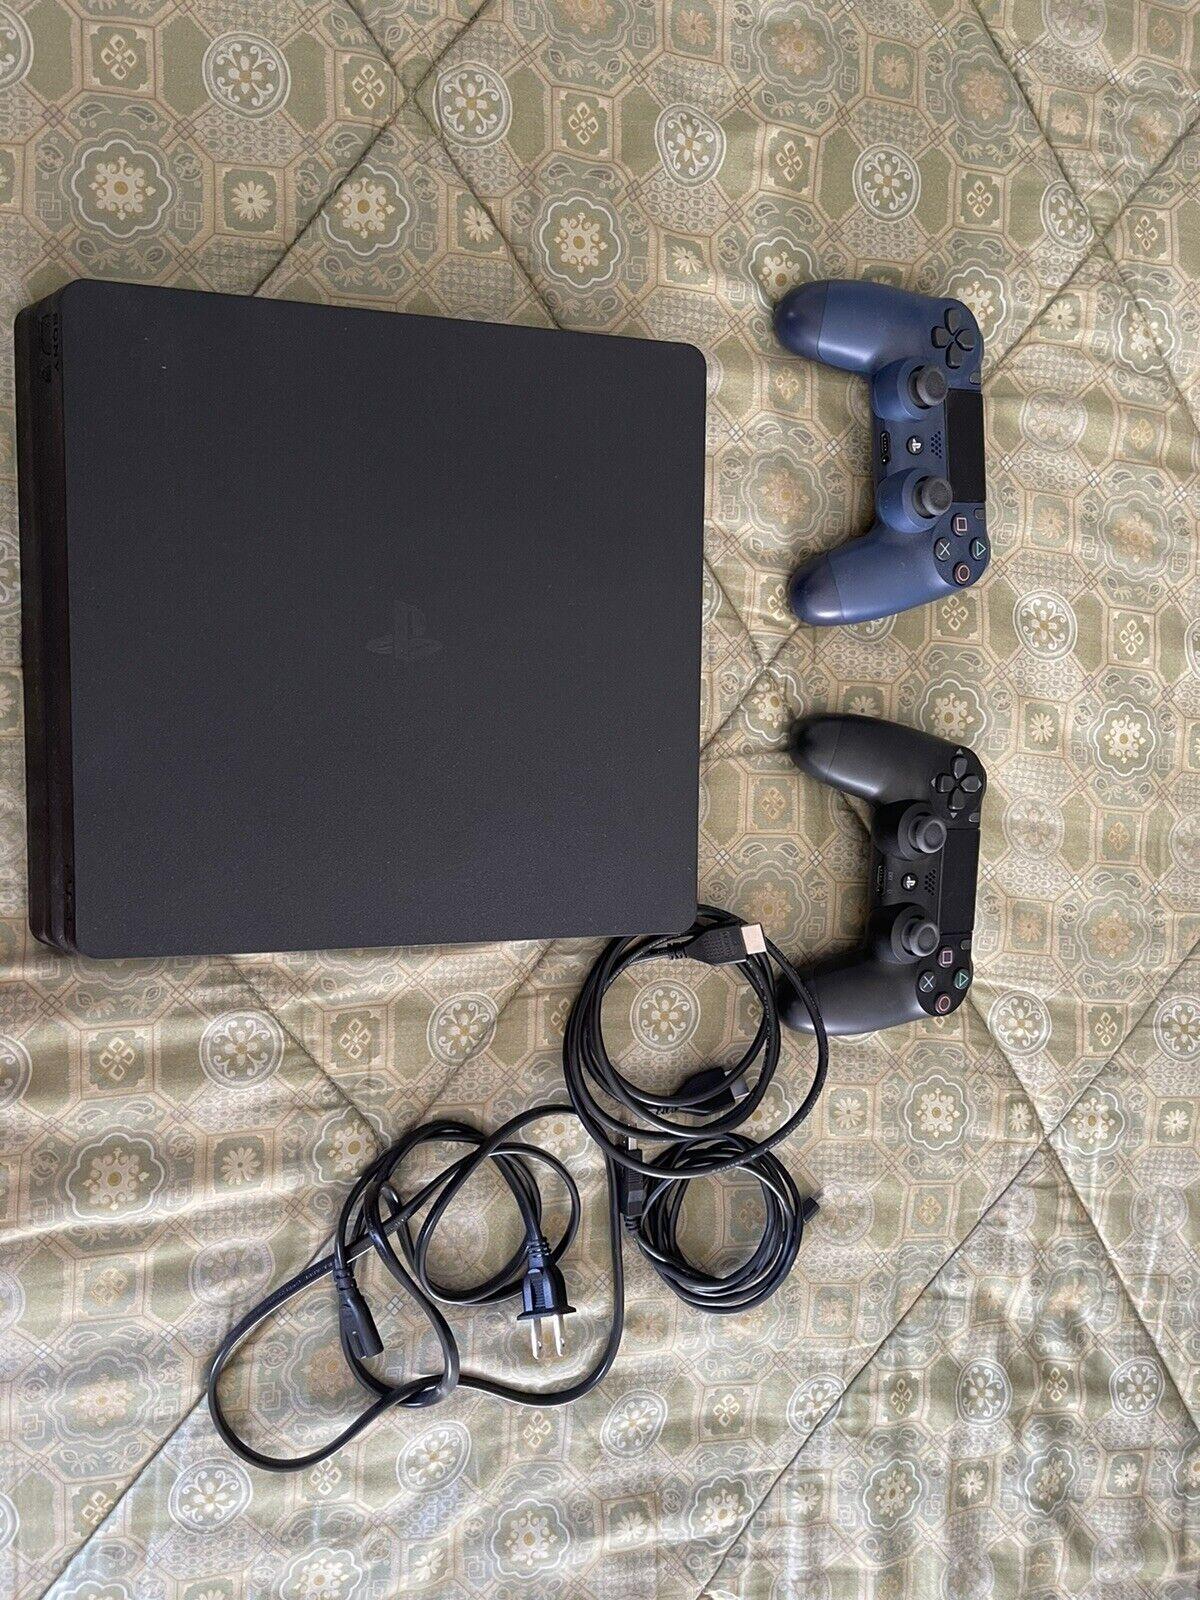 2019 Sony PlayStation 4 Slim 1TB Console With Bundle.